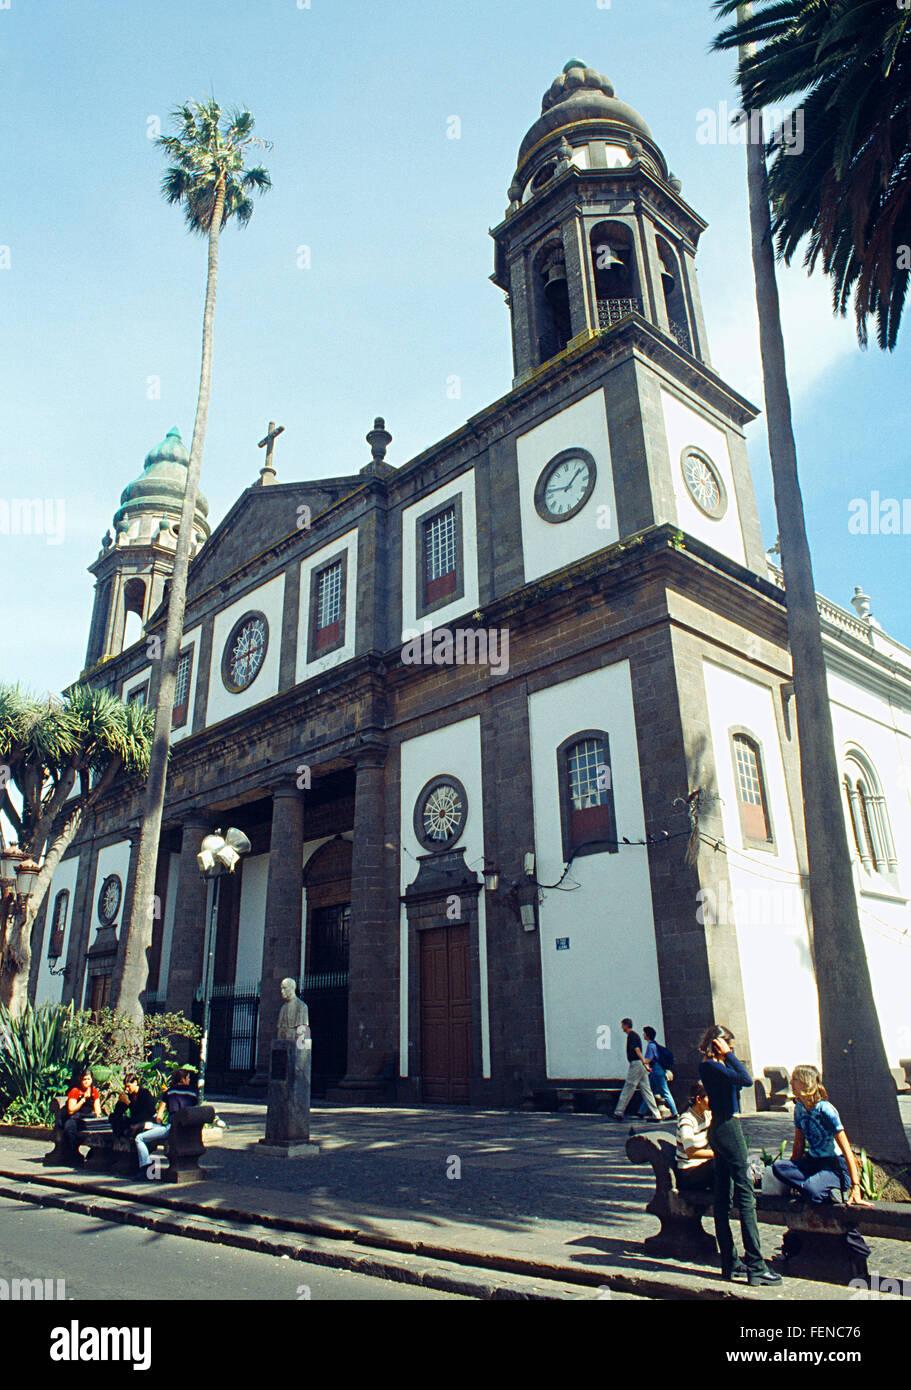 Facade of the cathedral. La Laguna, Tenerife island, Canary Islands, Spain. - Stock Image